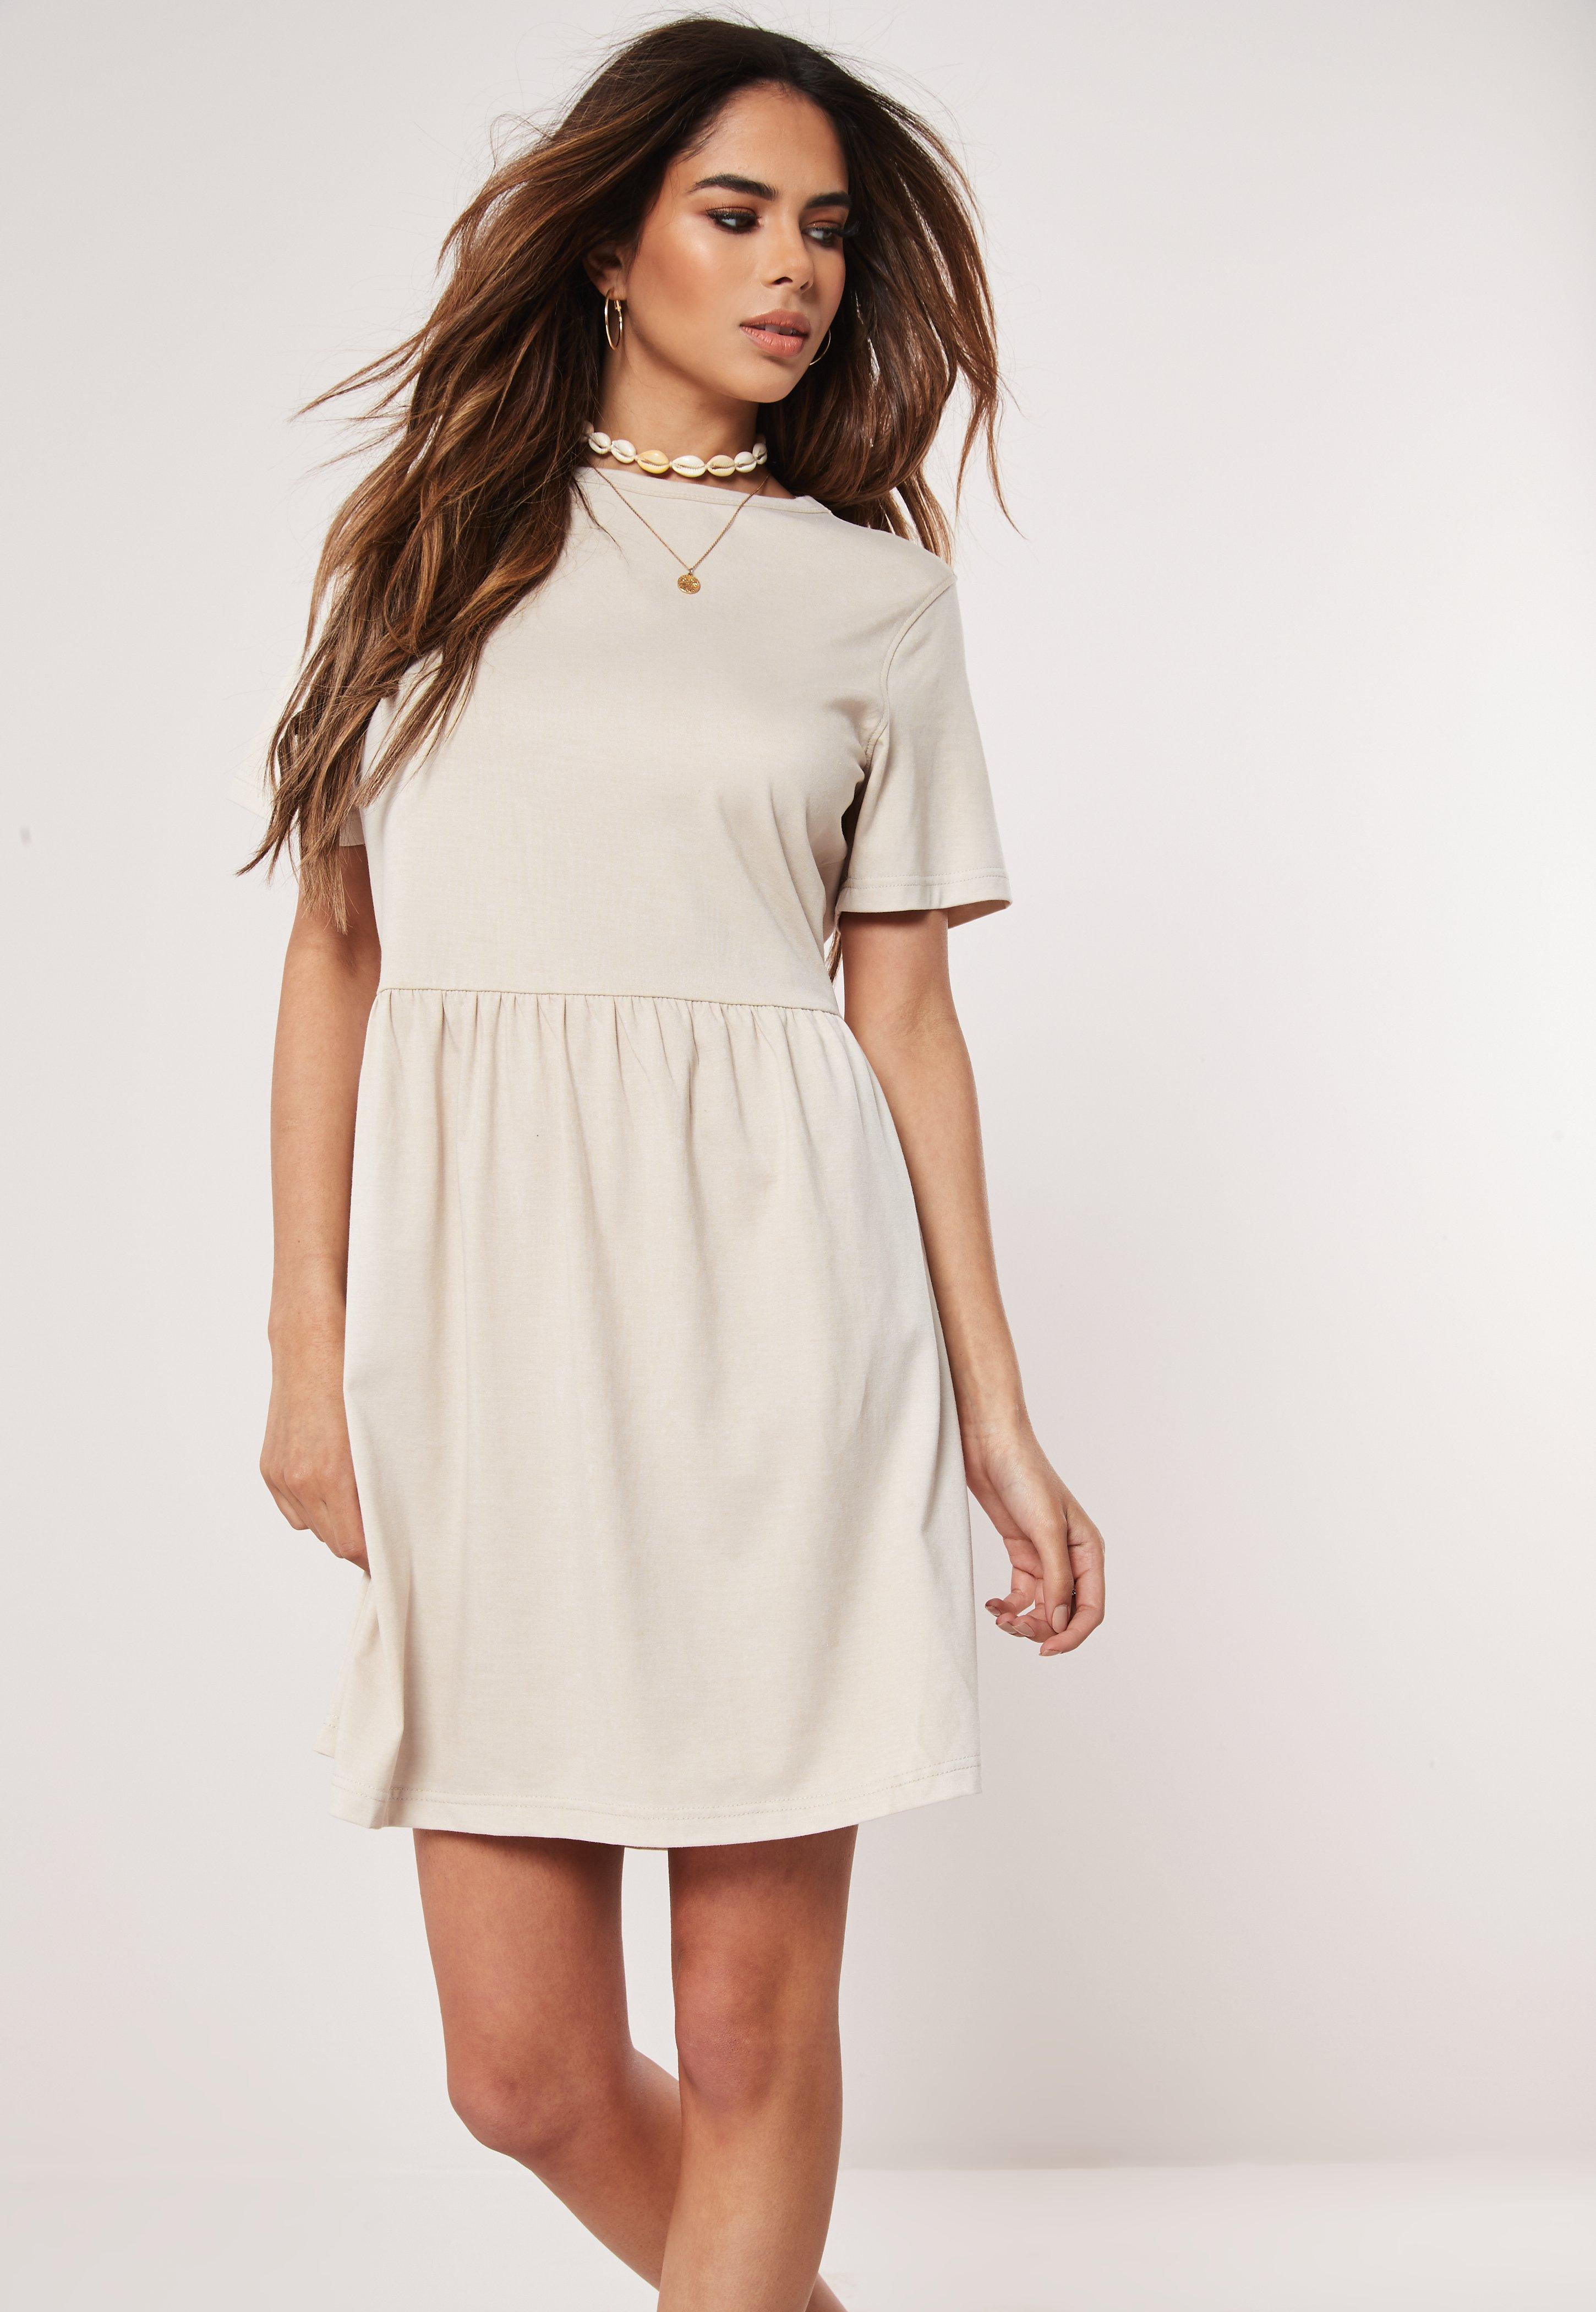 98c13fc6cecc Dresses UK